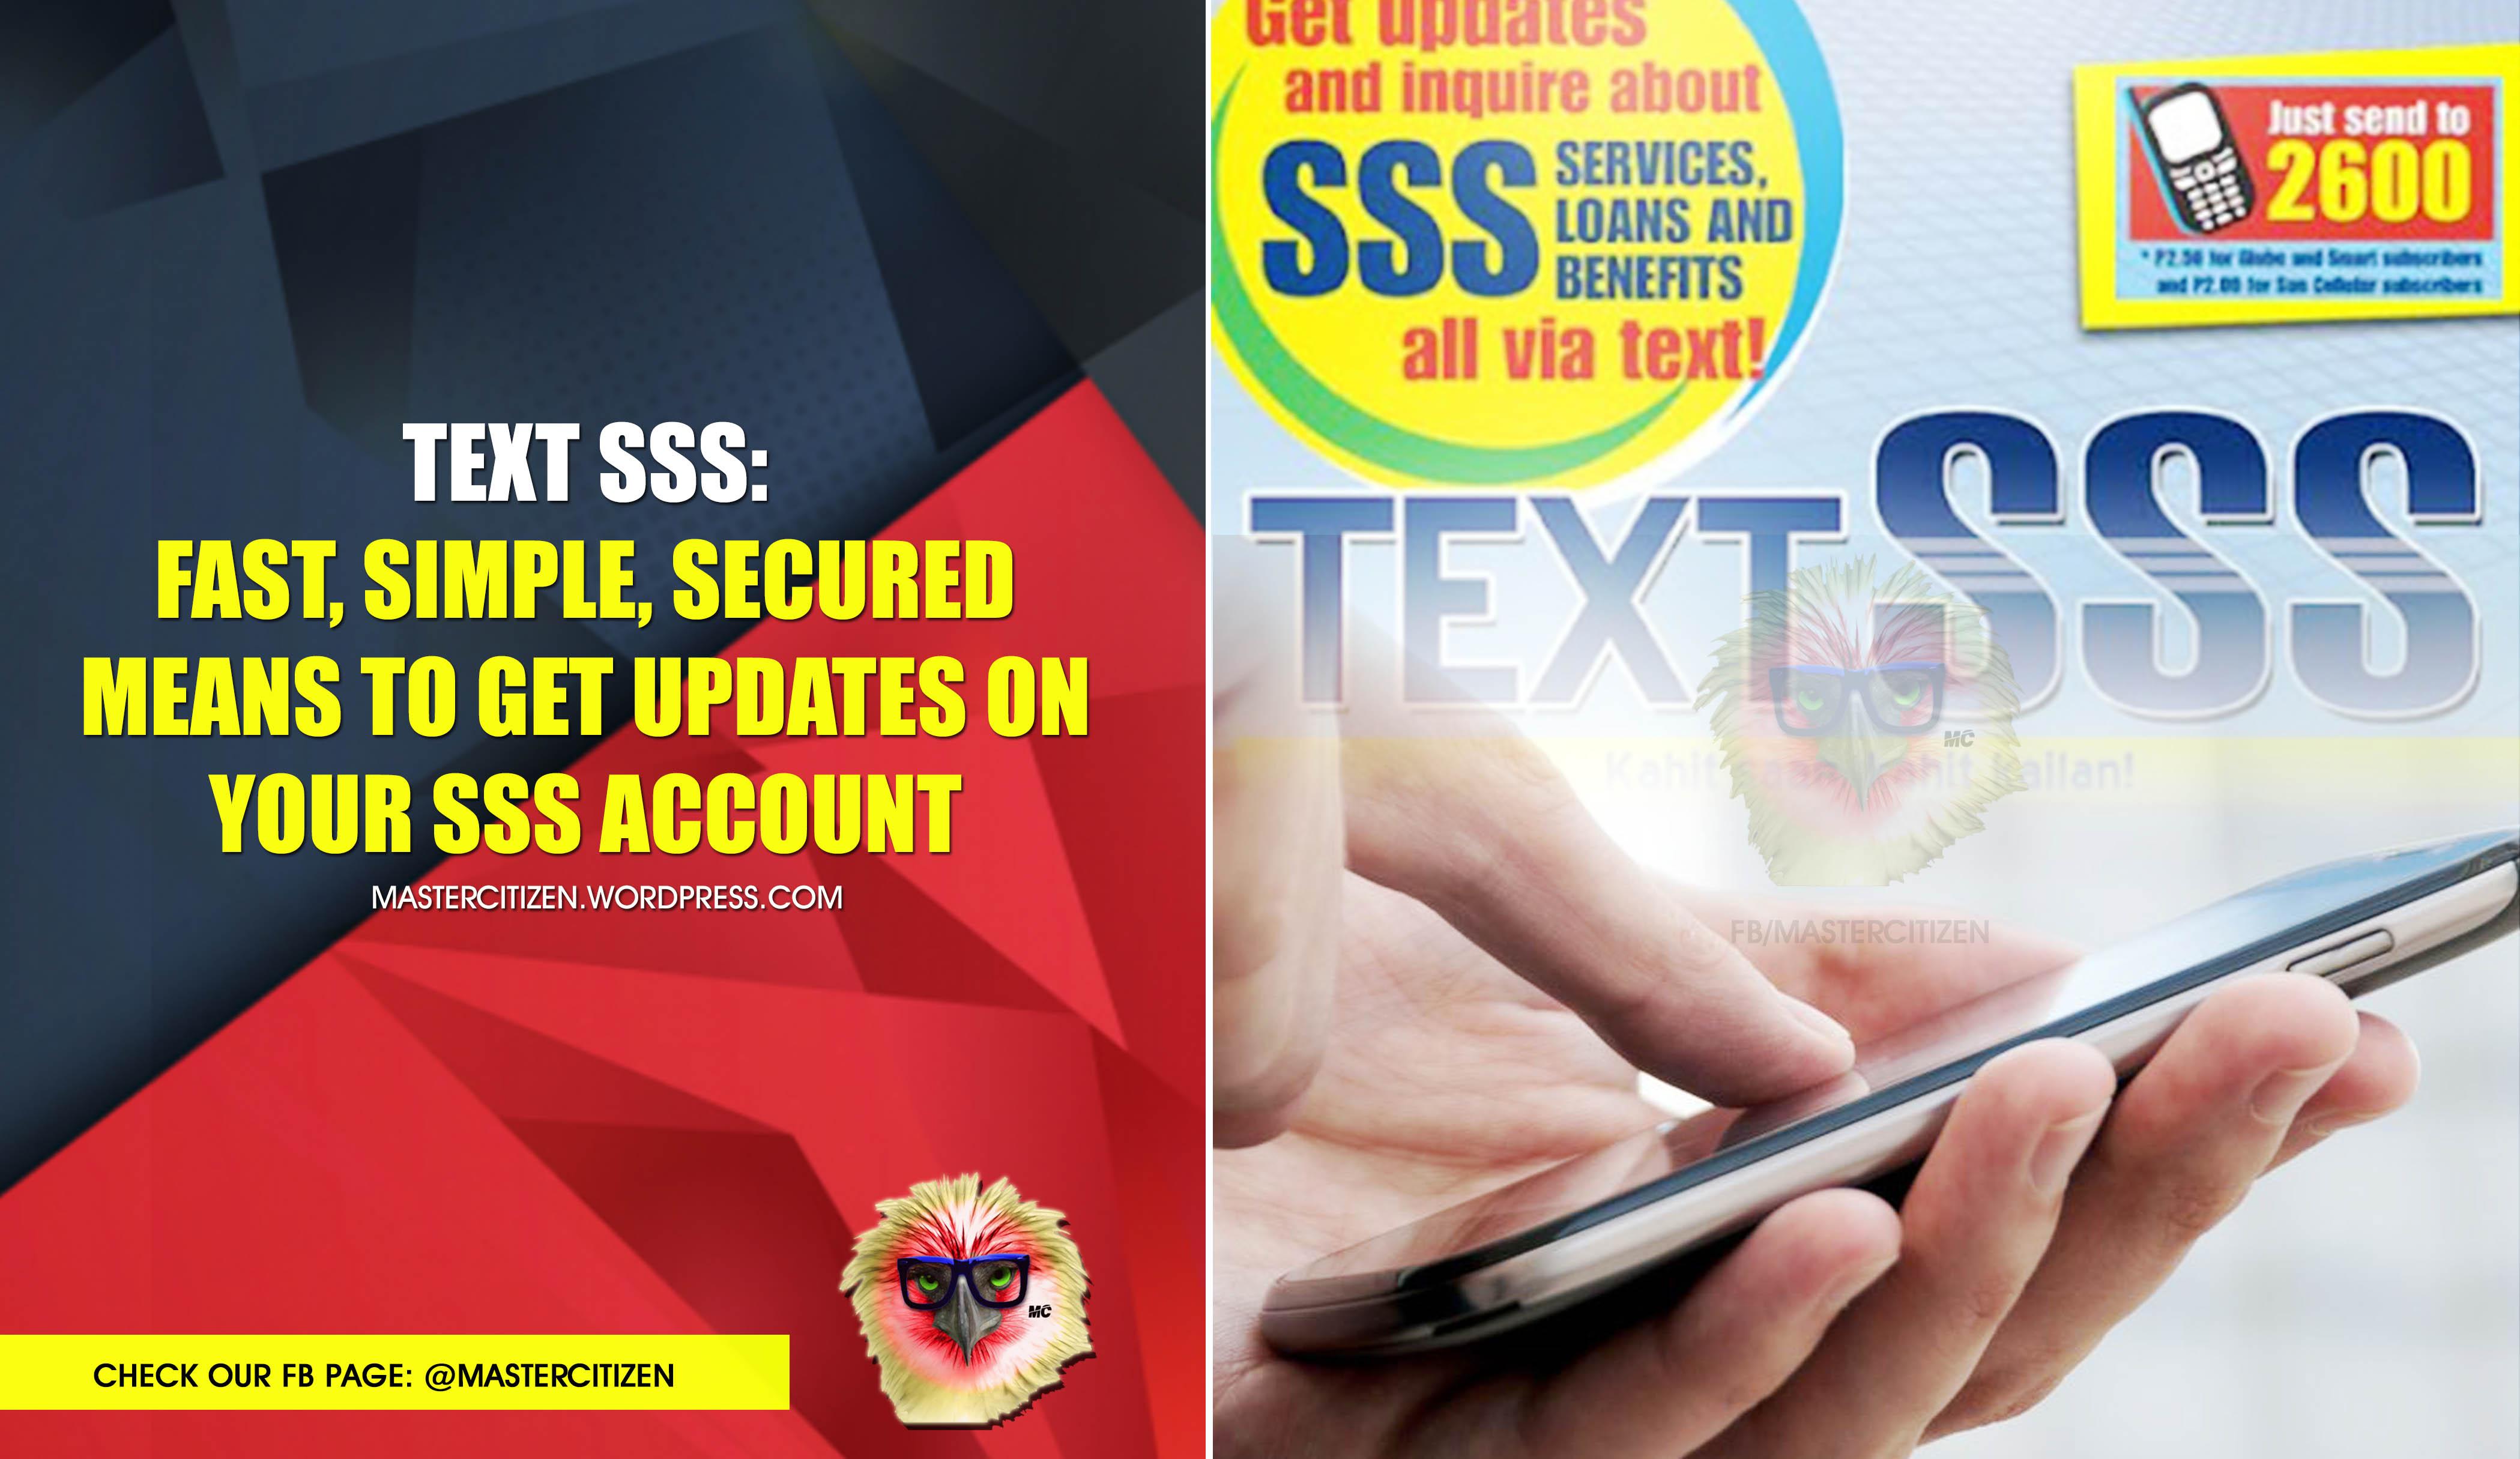 sss service hotline